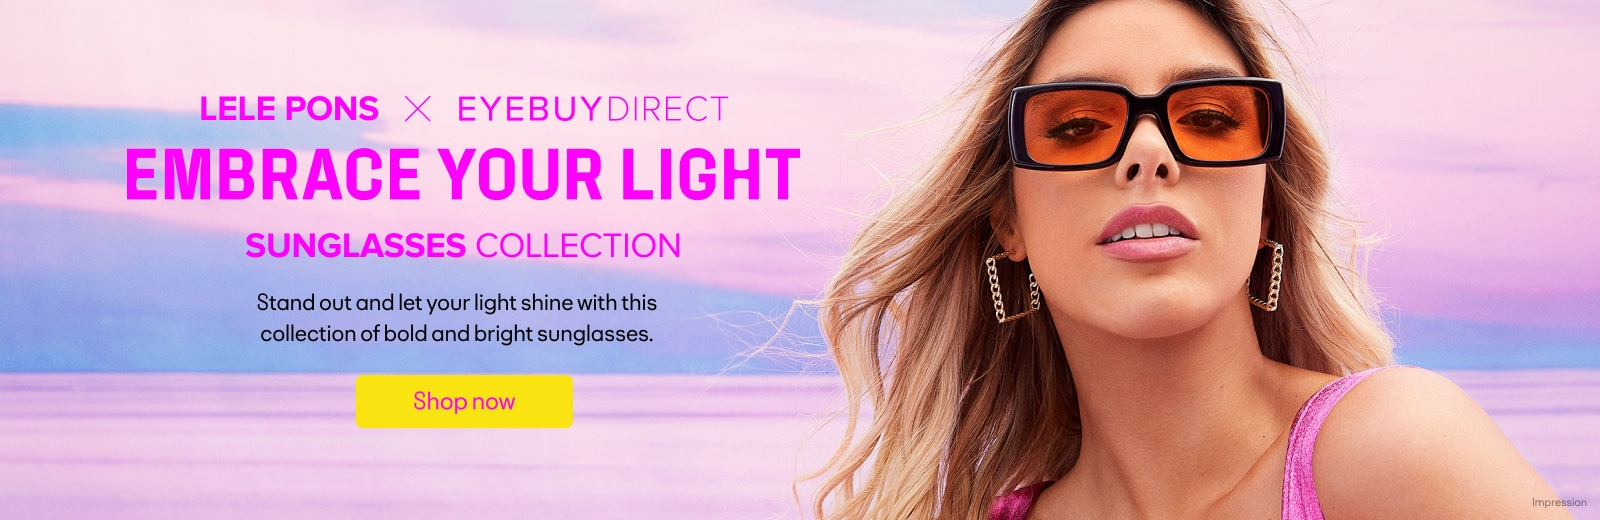 Lele Pons X Eyebuydirect Embrace your light sunglasses collection